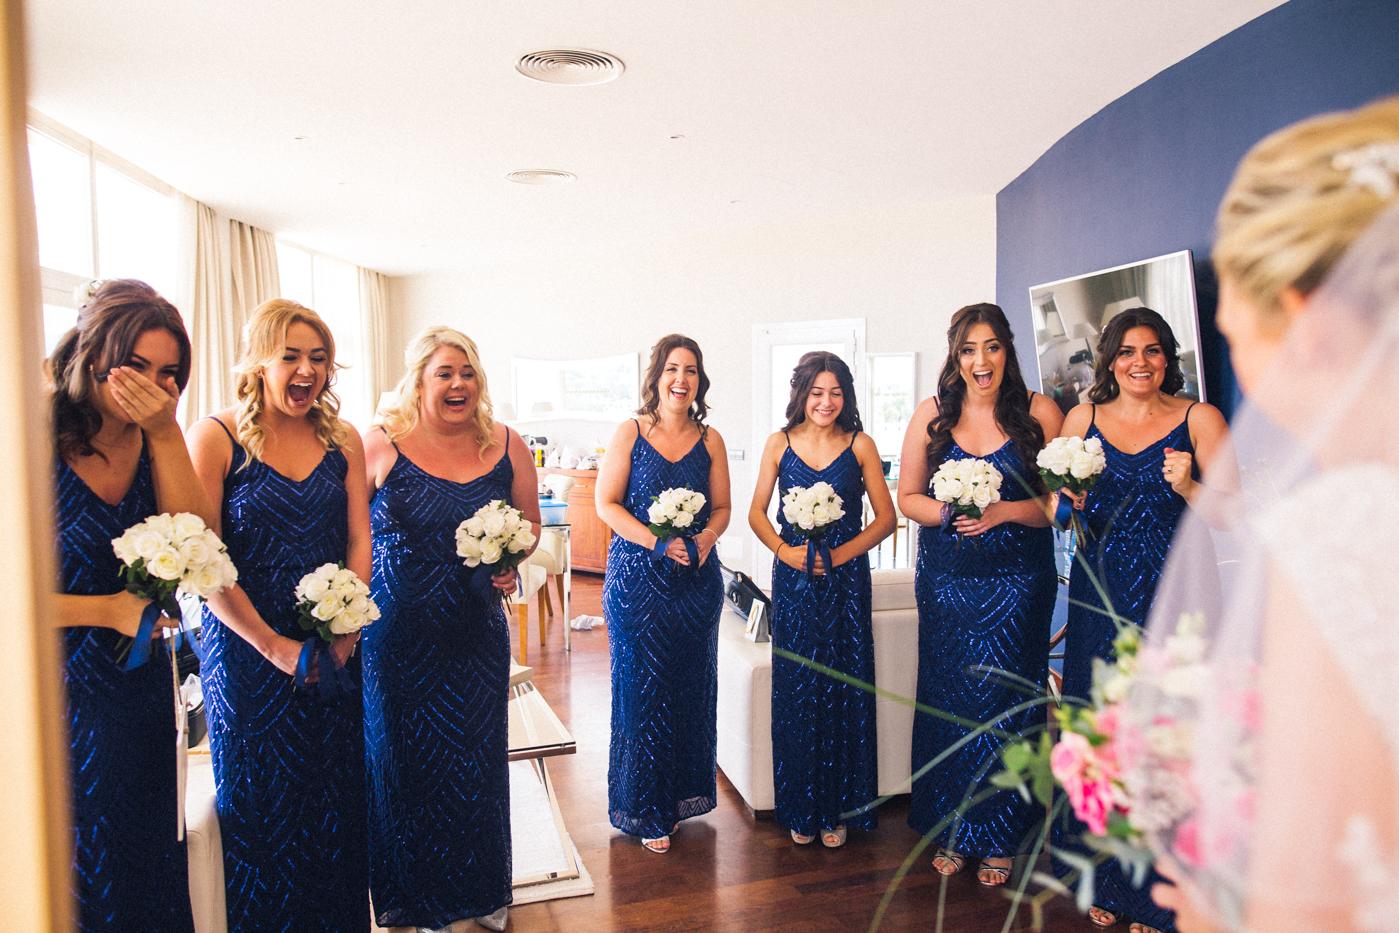 teesside-middlesbrough-north-east-wedding-photographer-creative-wedding-venues-0031.jpg